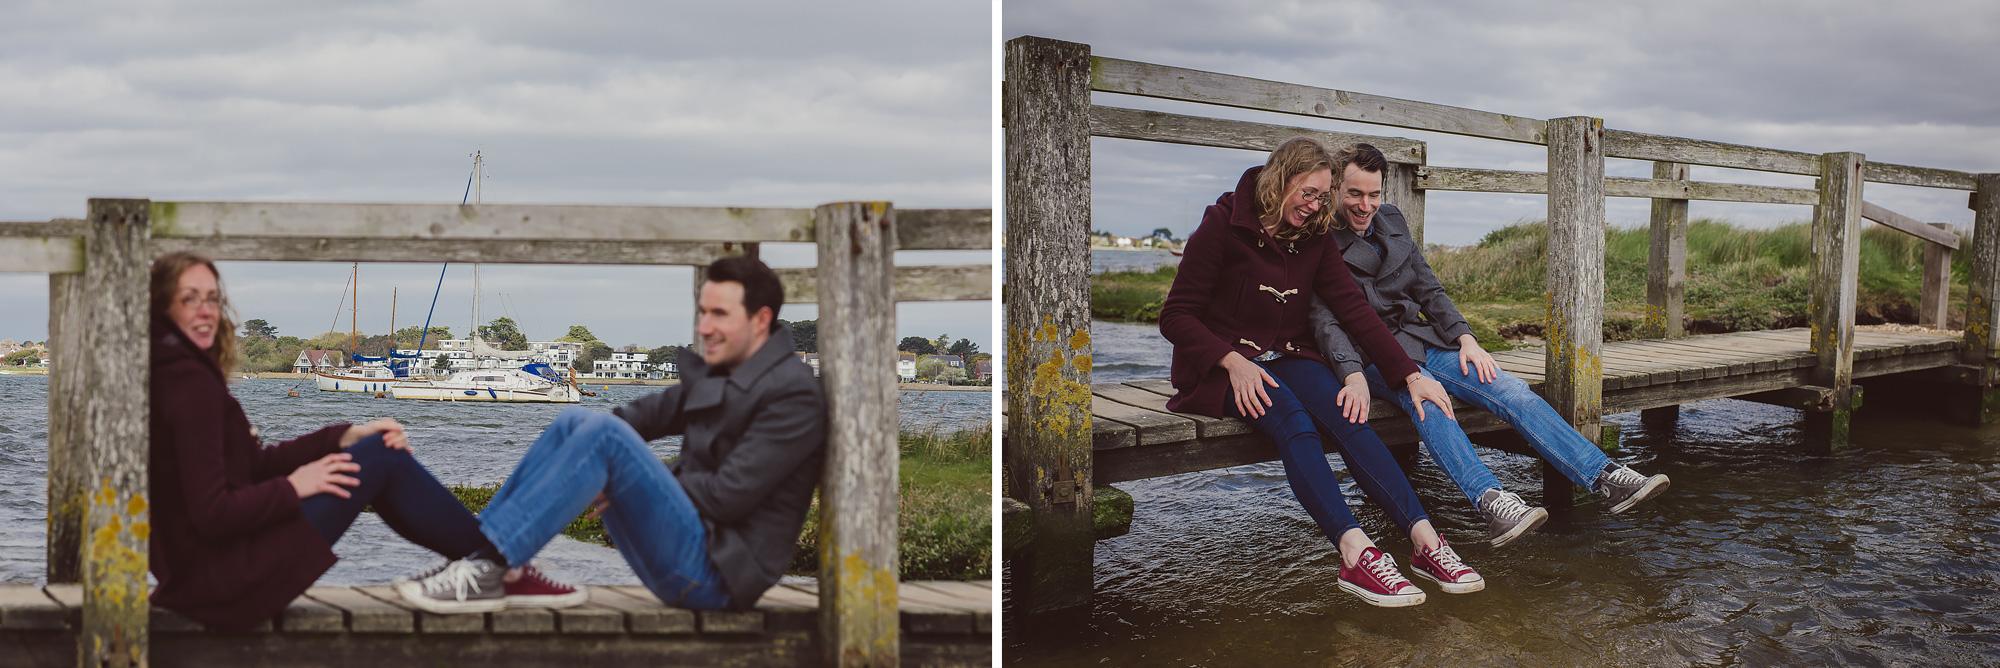 creative-documentary-wedding-photography-pre-shoot-adventure-hengistbury-head.jpg